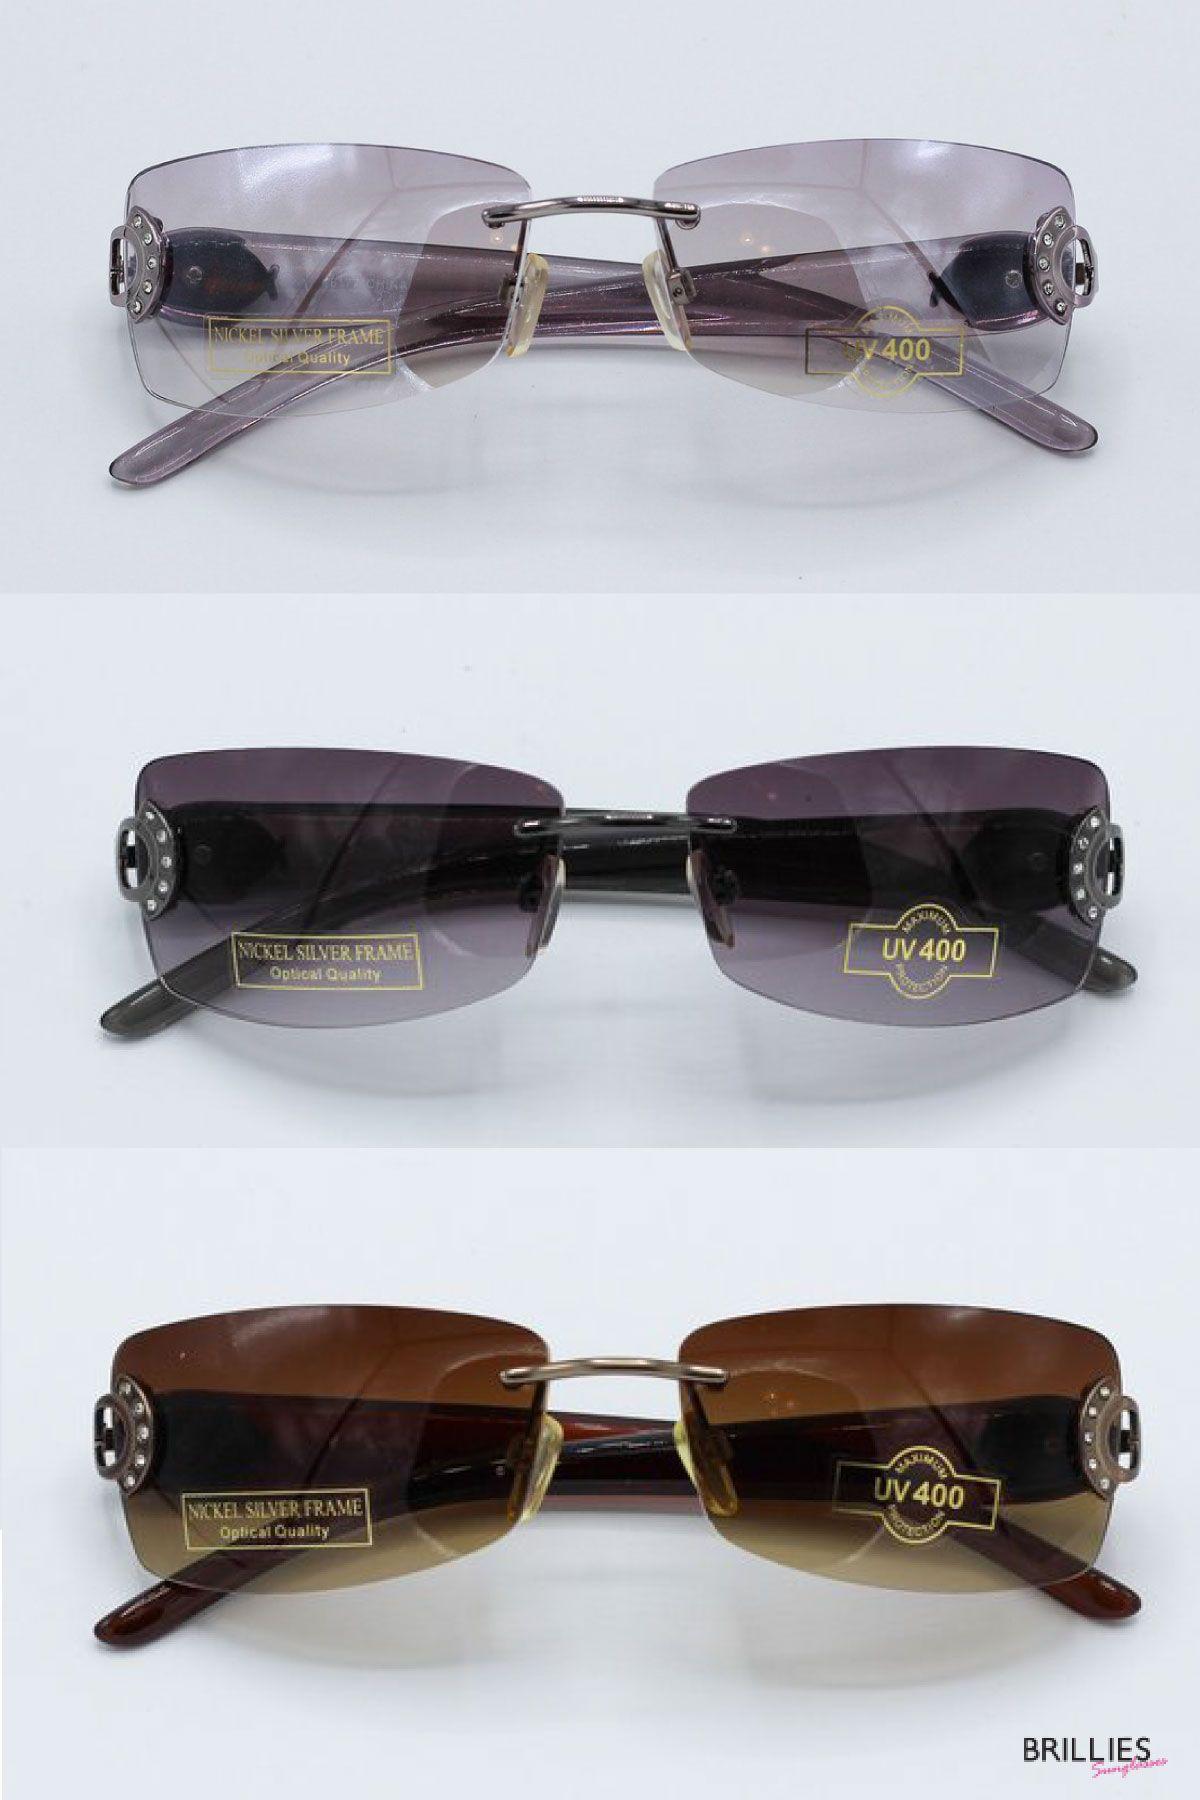 Square Rimless Vintage Glasses Brown Square Frame Sunglasses 90s Fashion Womens Retro Eyewear Retro Eyewear Sunglasses Sunglass Frames